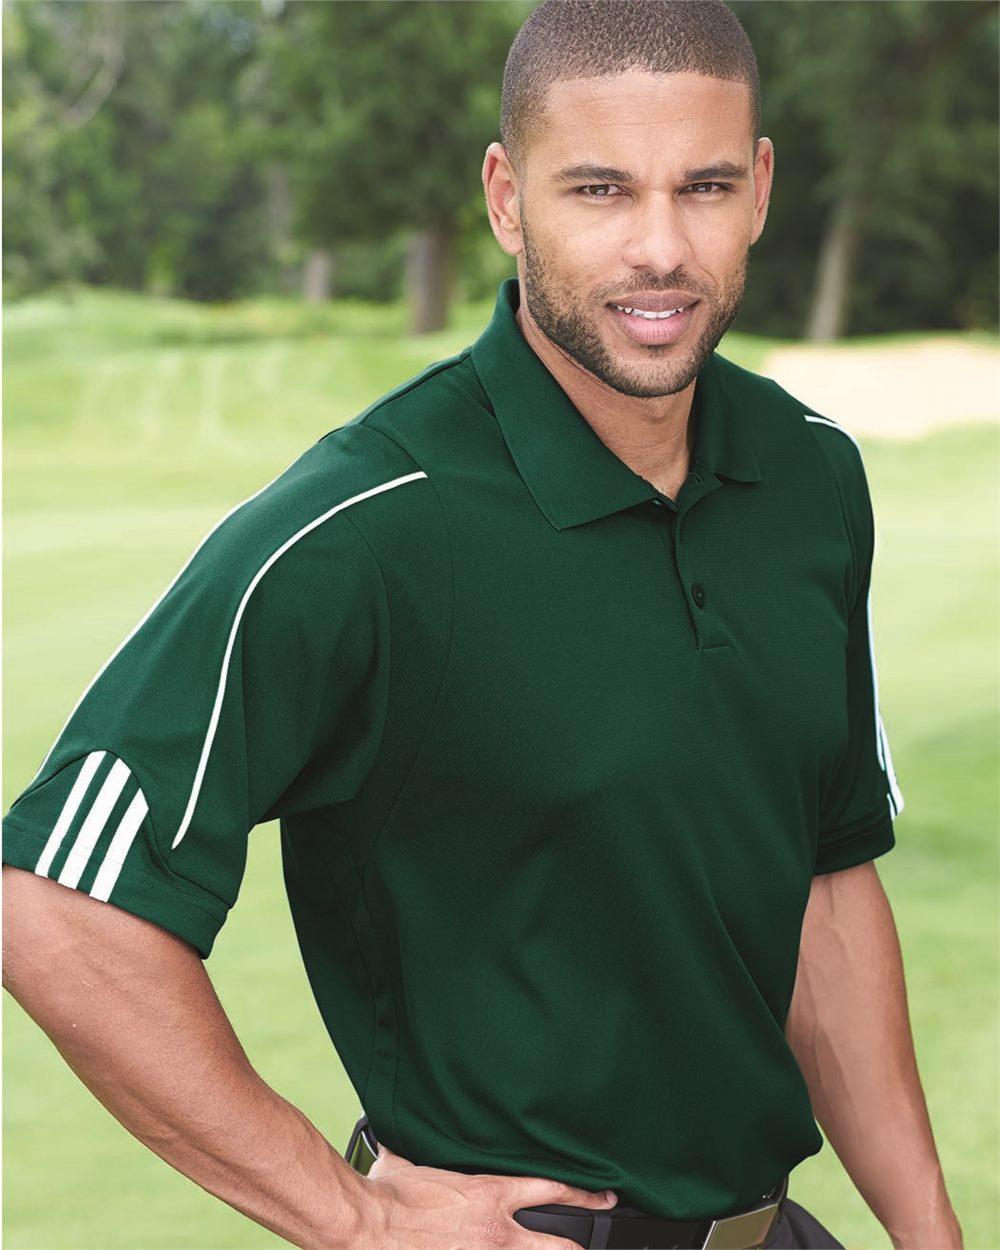 Adidas Climalite 3-Stripes Cuff Sport Shirt